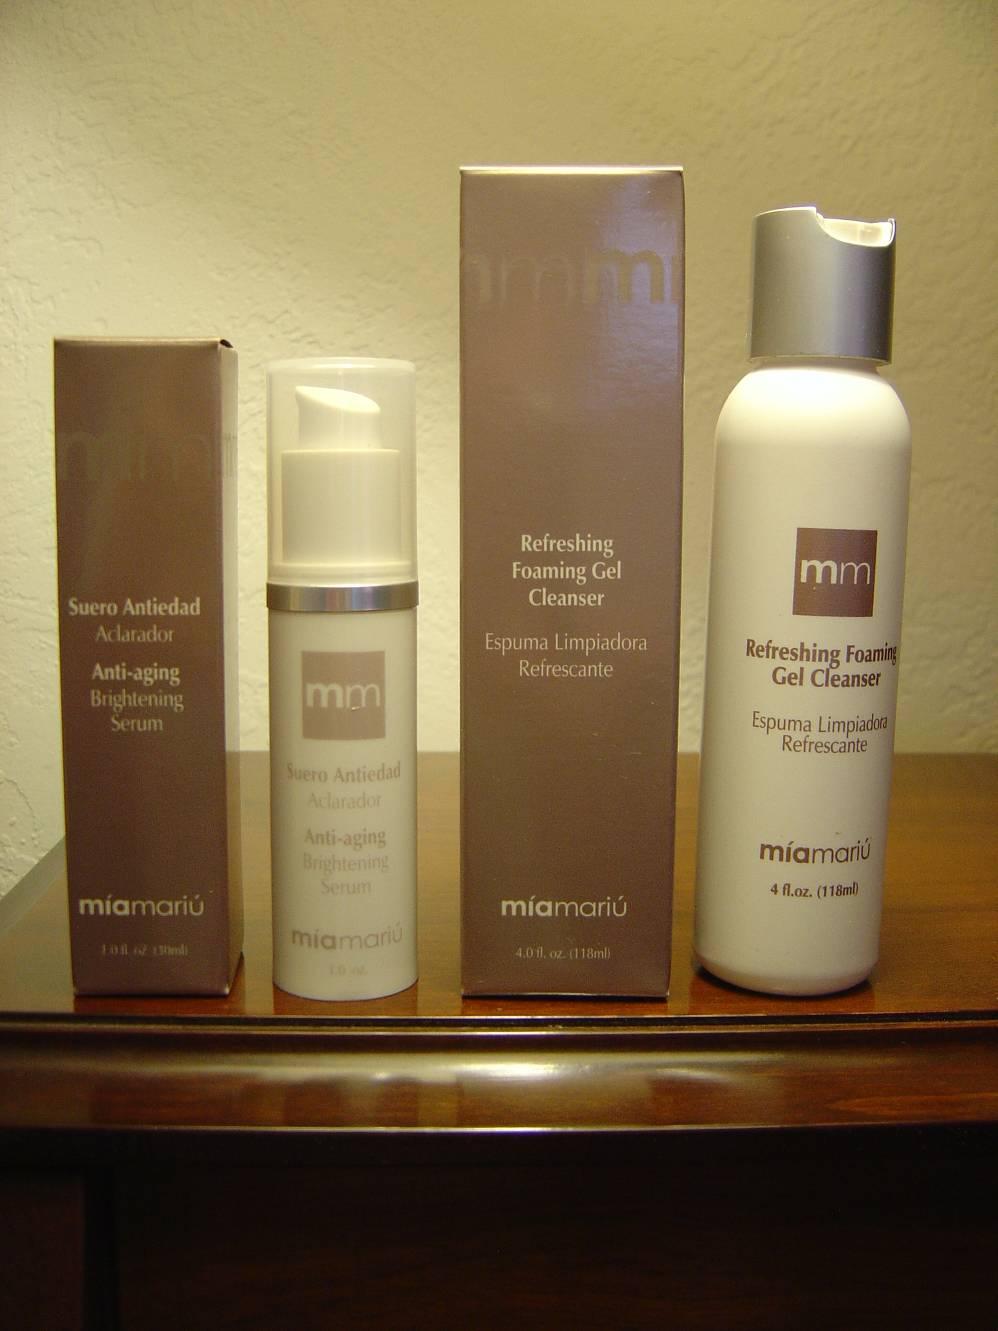 Mia Mariu Anti-Aging Brightening Serum & Refreshing Foaming Gel Cleanser.jpeg